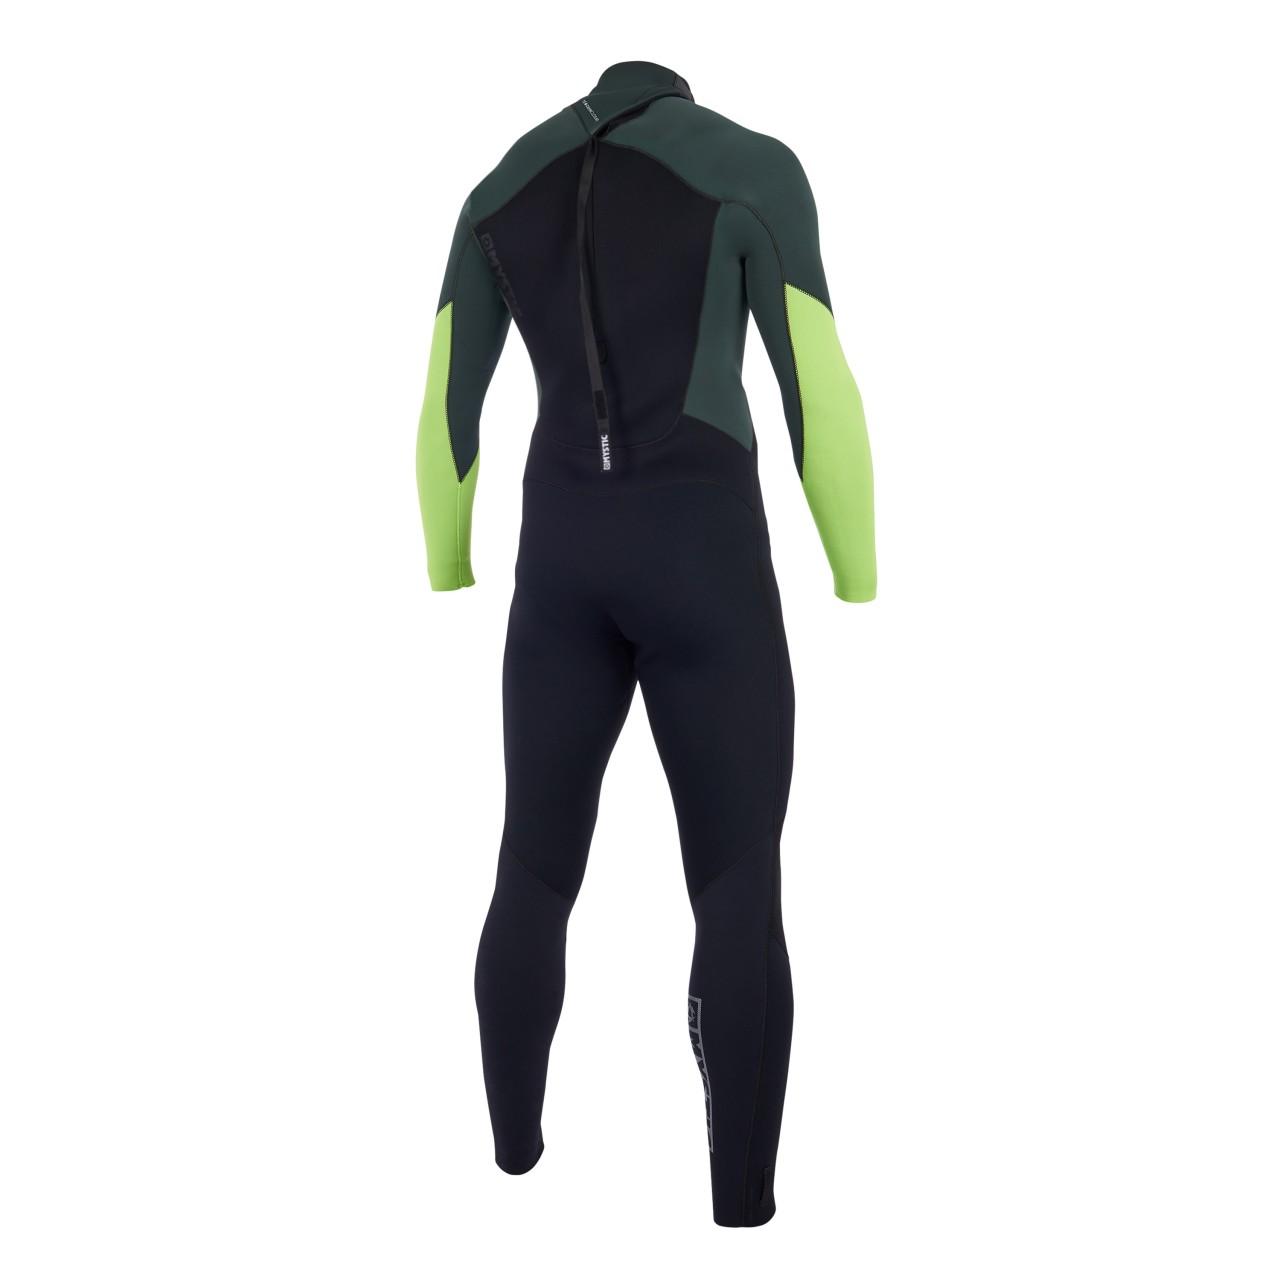 2019 Mystic Star 3 2 Fullsuit back-zip Teal 043cc7e55